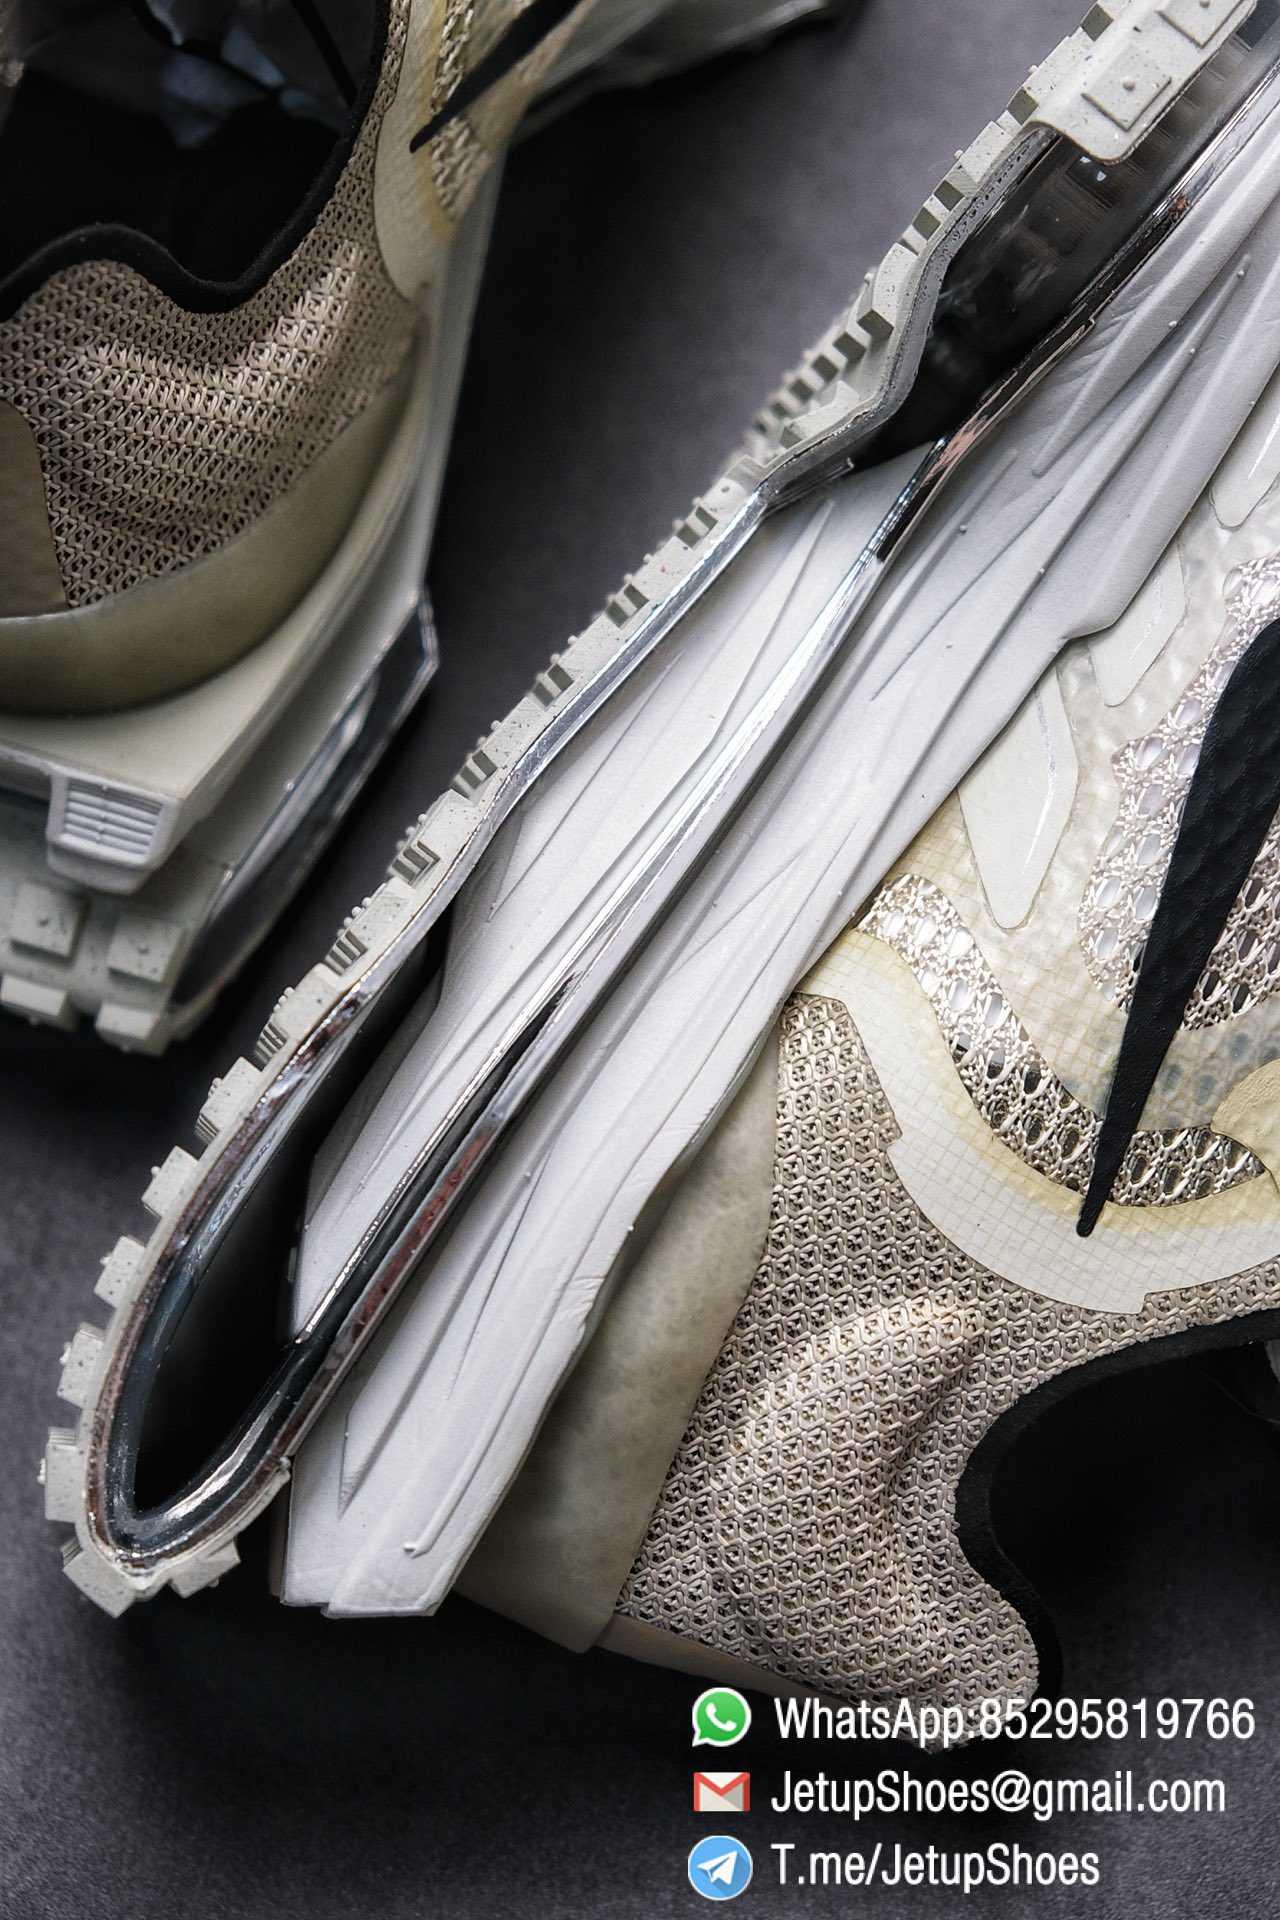 Best Replica Sneakers Matthew M Williams x Nike Zoom 004 Stone CU0676 200 Top Sneakers 09